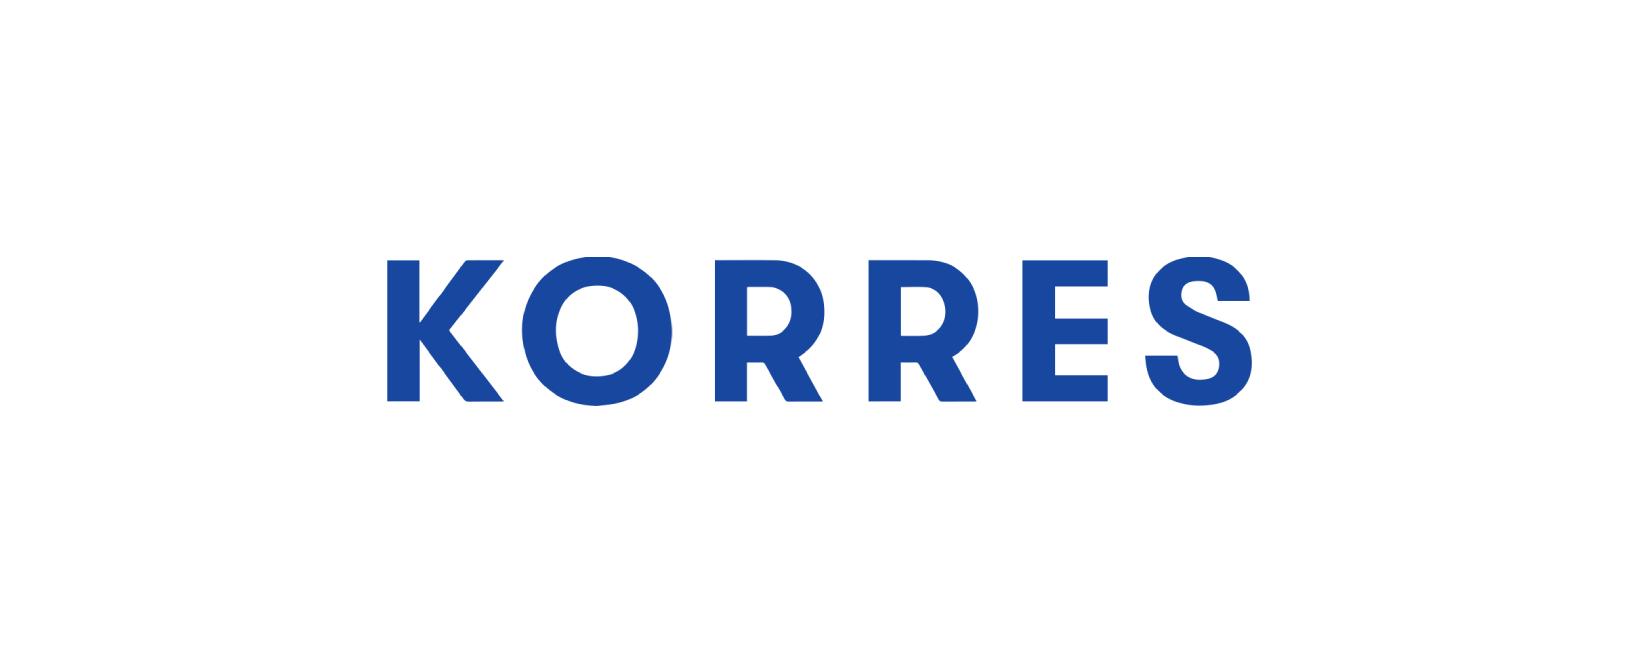 KORRES Promo Codes, Coupon 2021